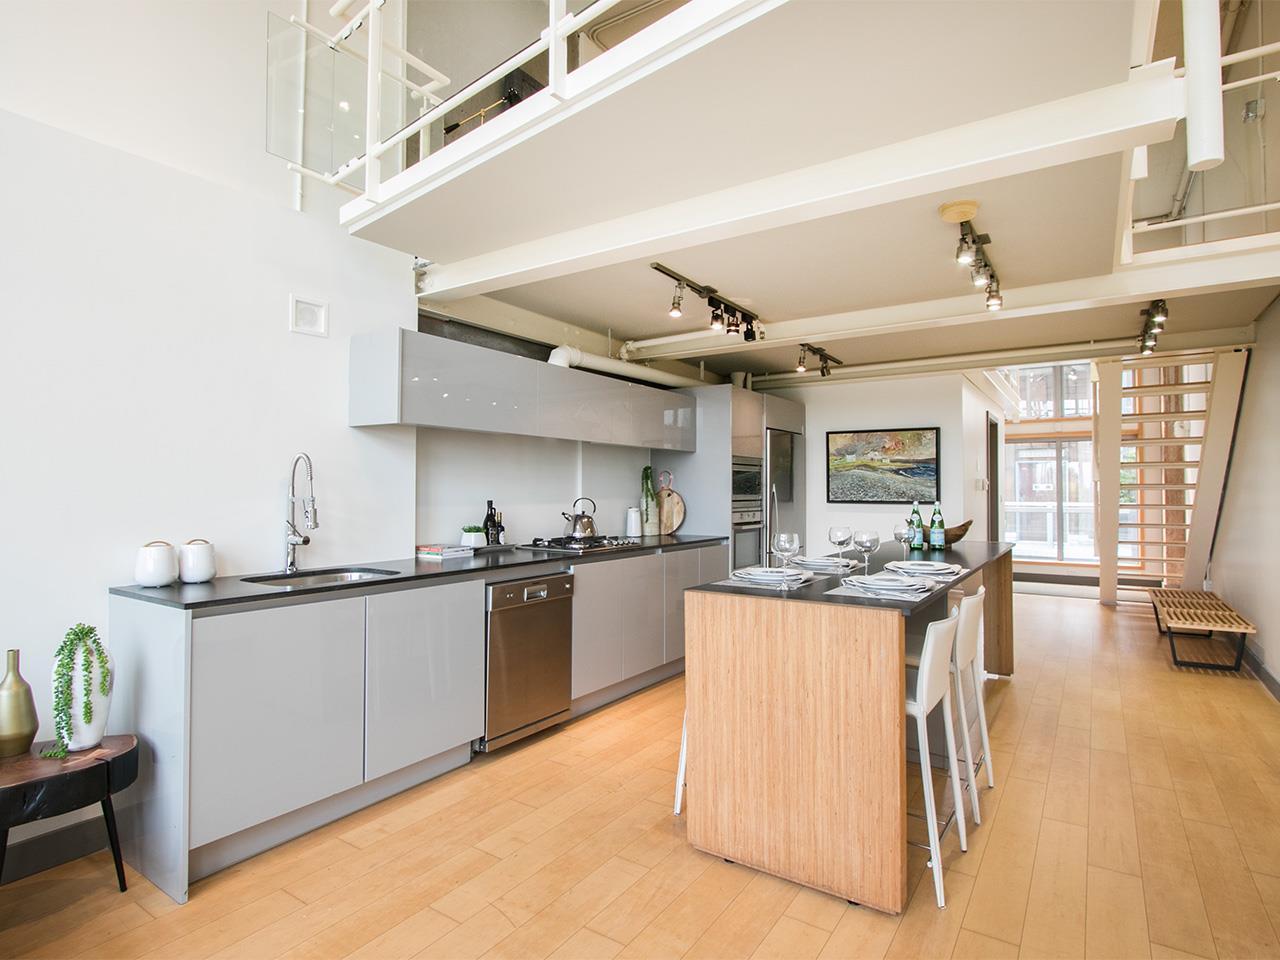 Condo Apartment at 403 1529 W 6TH AVENUE, Unit 403, Vancouver West, British Columbia. Image 6